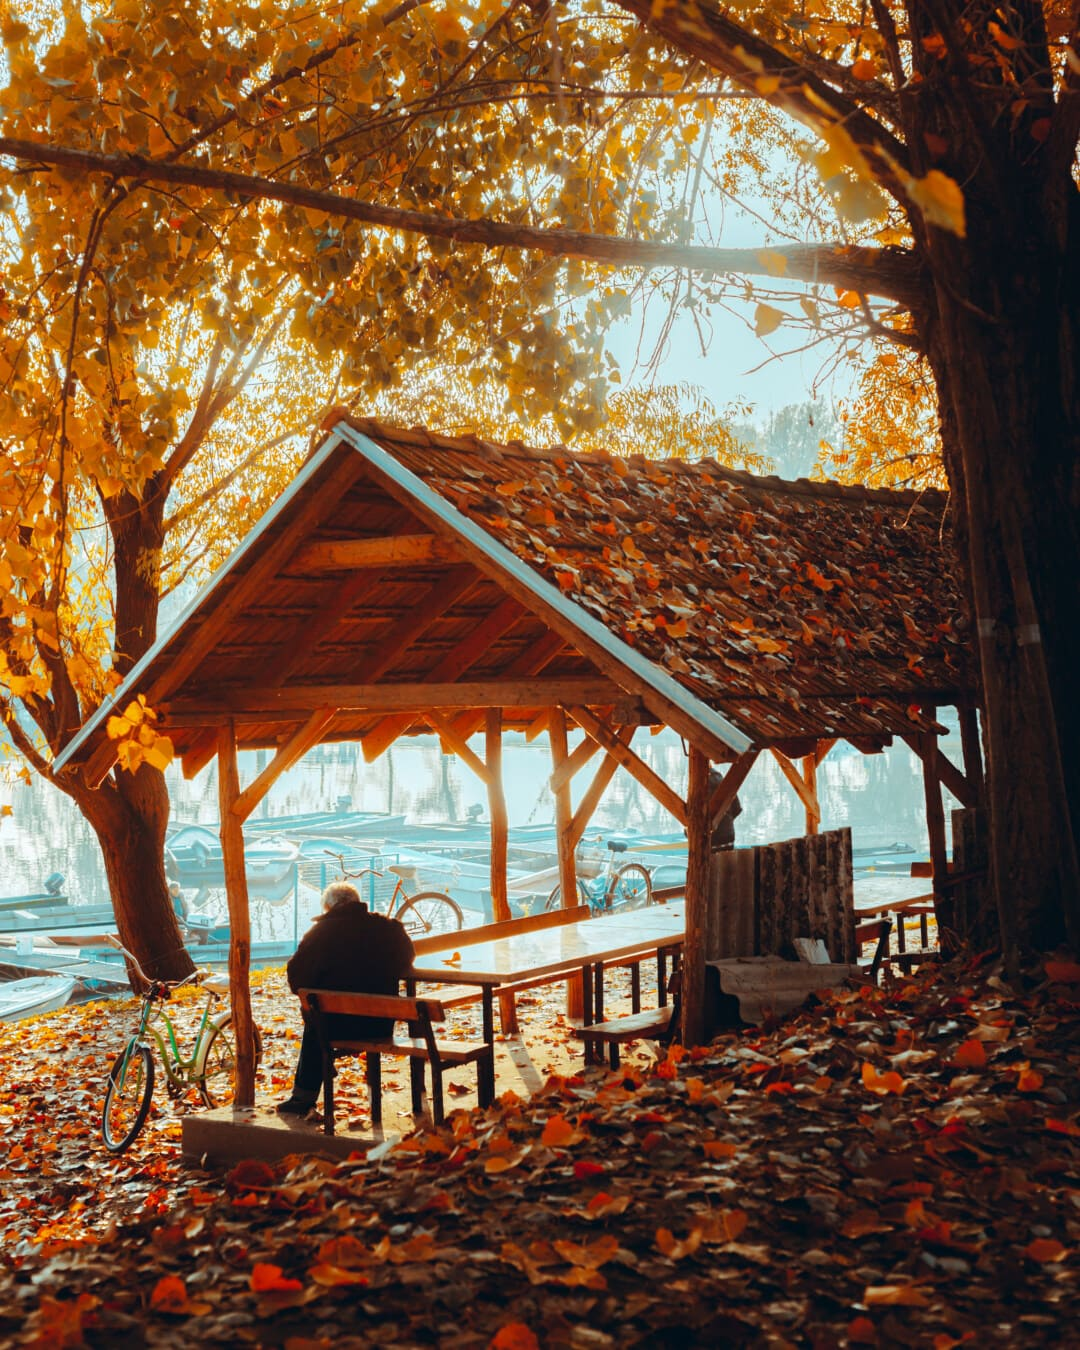 Flussufer, Schuppen, Herbst, veranda, Hafen, ältere Menschen, Mann, sitzen, Holz, Gebäude